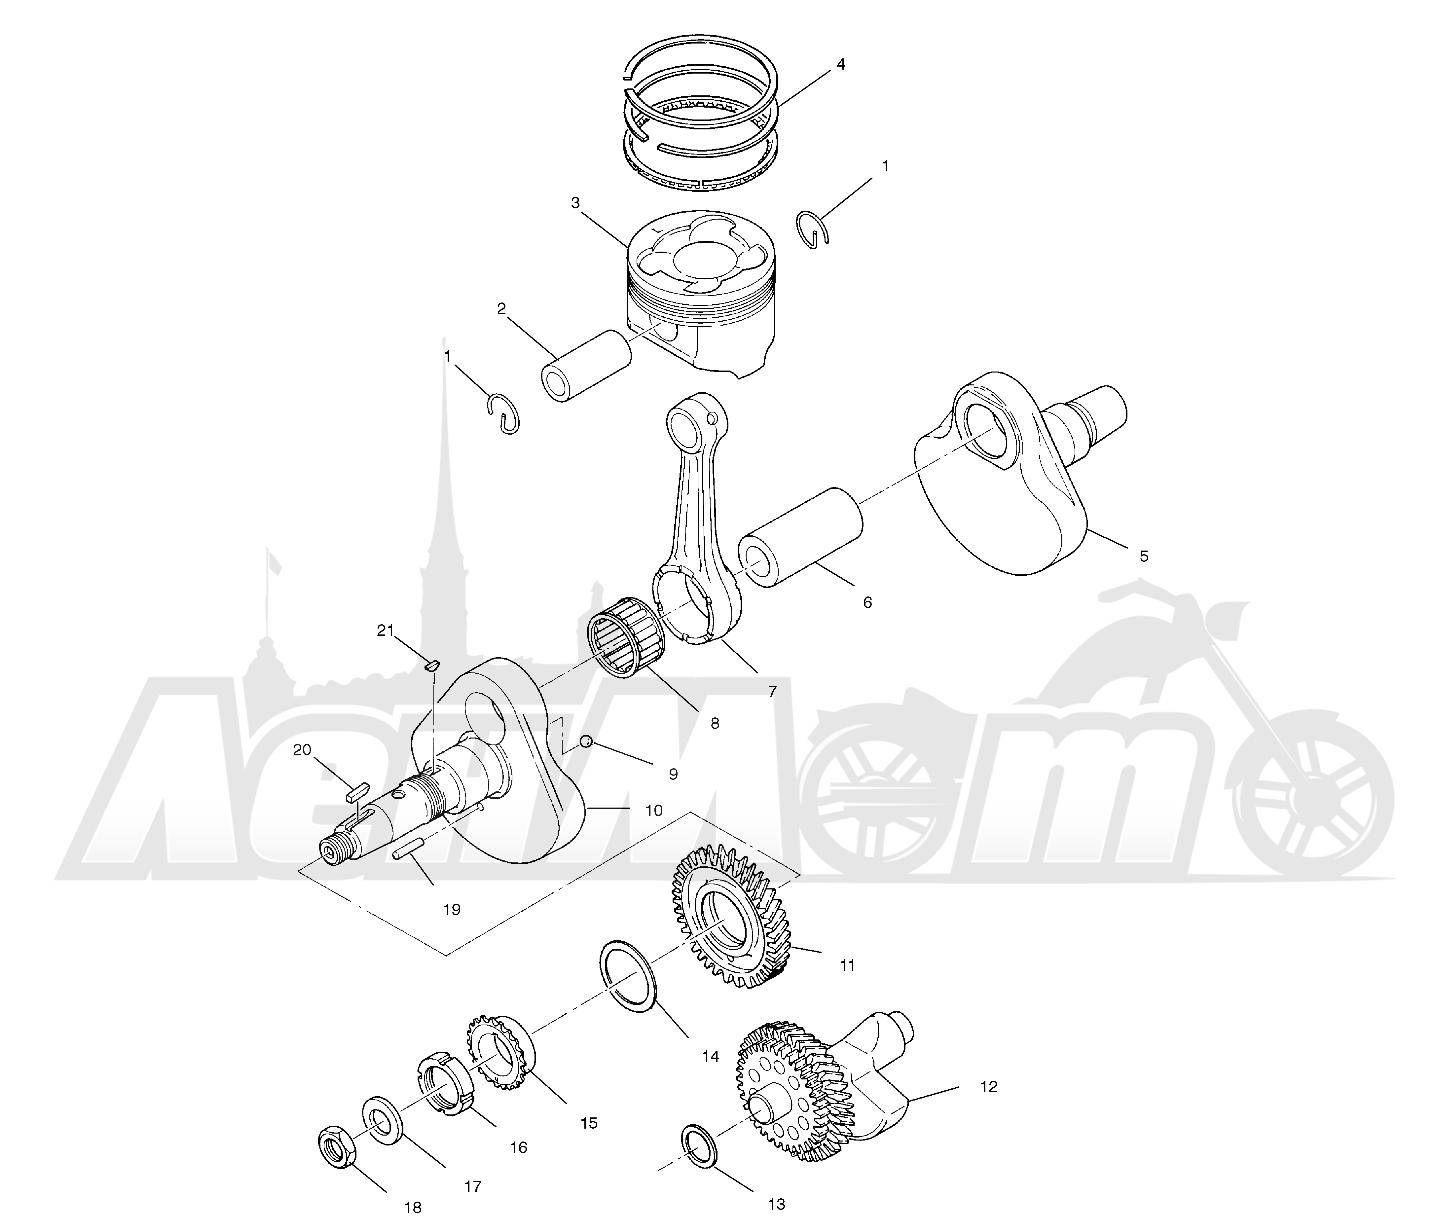 Запчасти для Квадроцикла Polaris 1997 SWEDISH SPORTSMAN 50 - S97CH50E Раздел: CRANKSHAFT AND PISTON - W97CH50A | коленвал и поршень W97CH50A